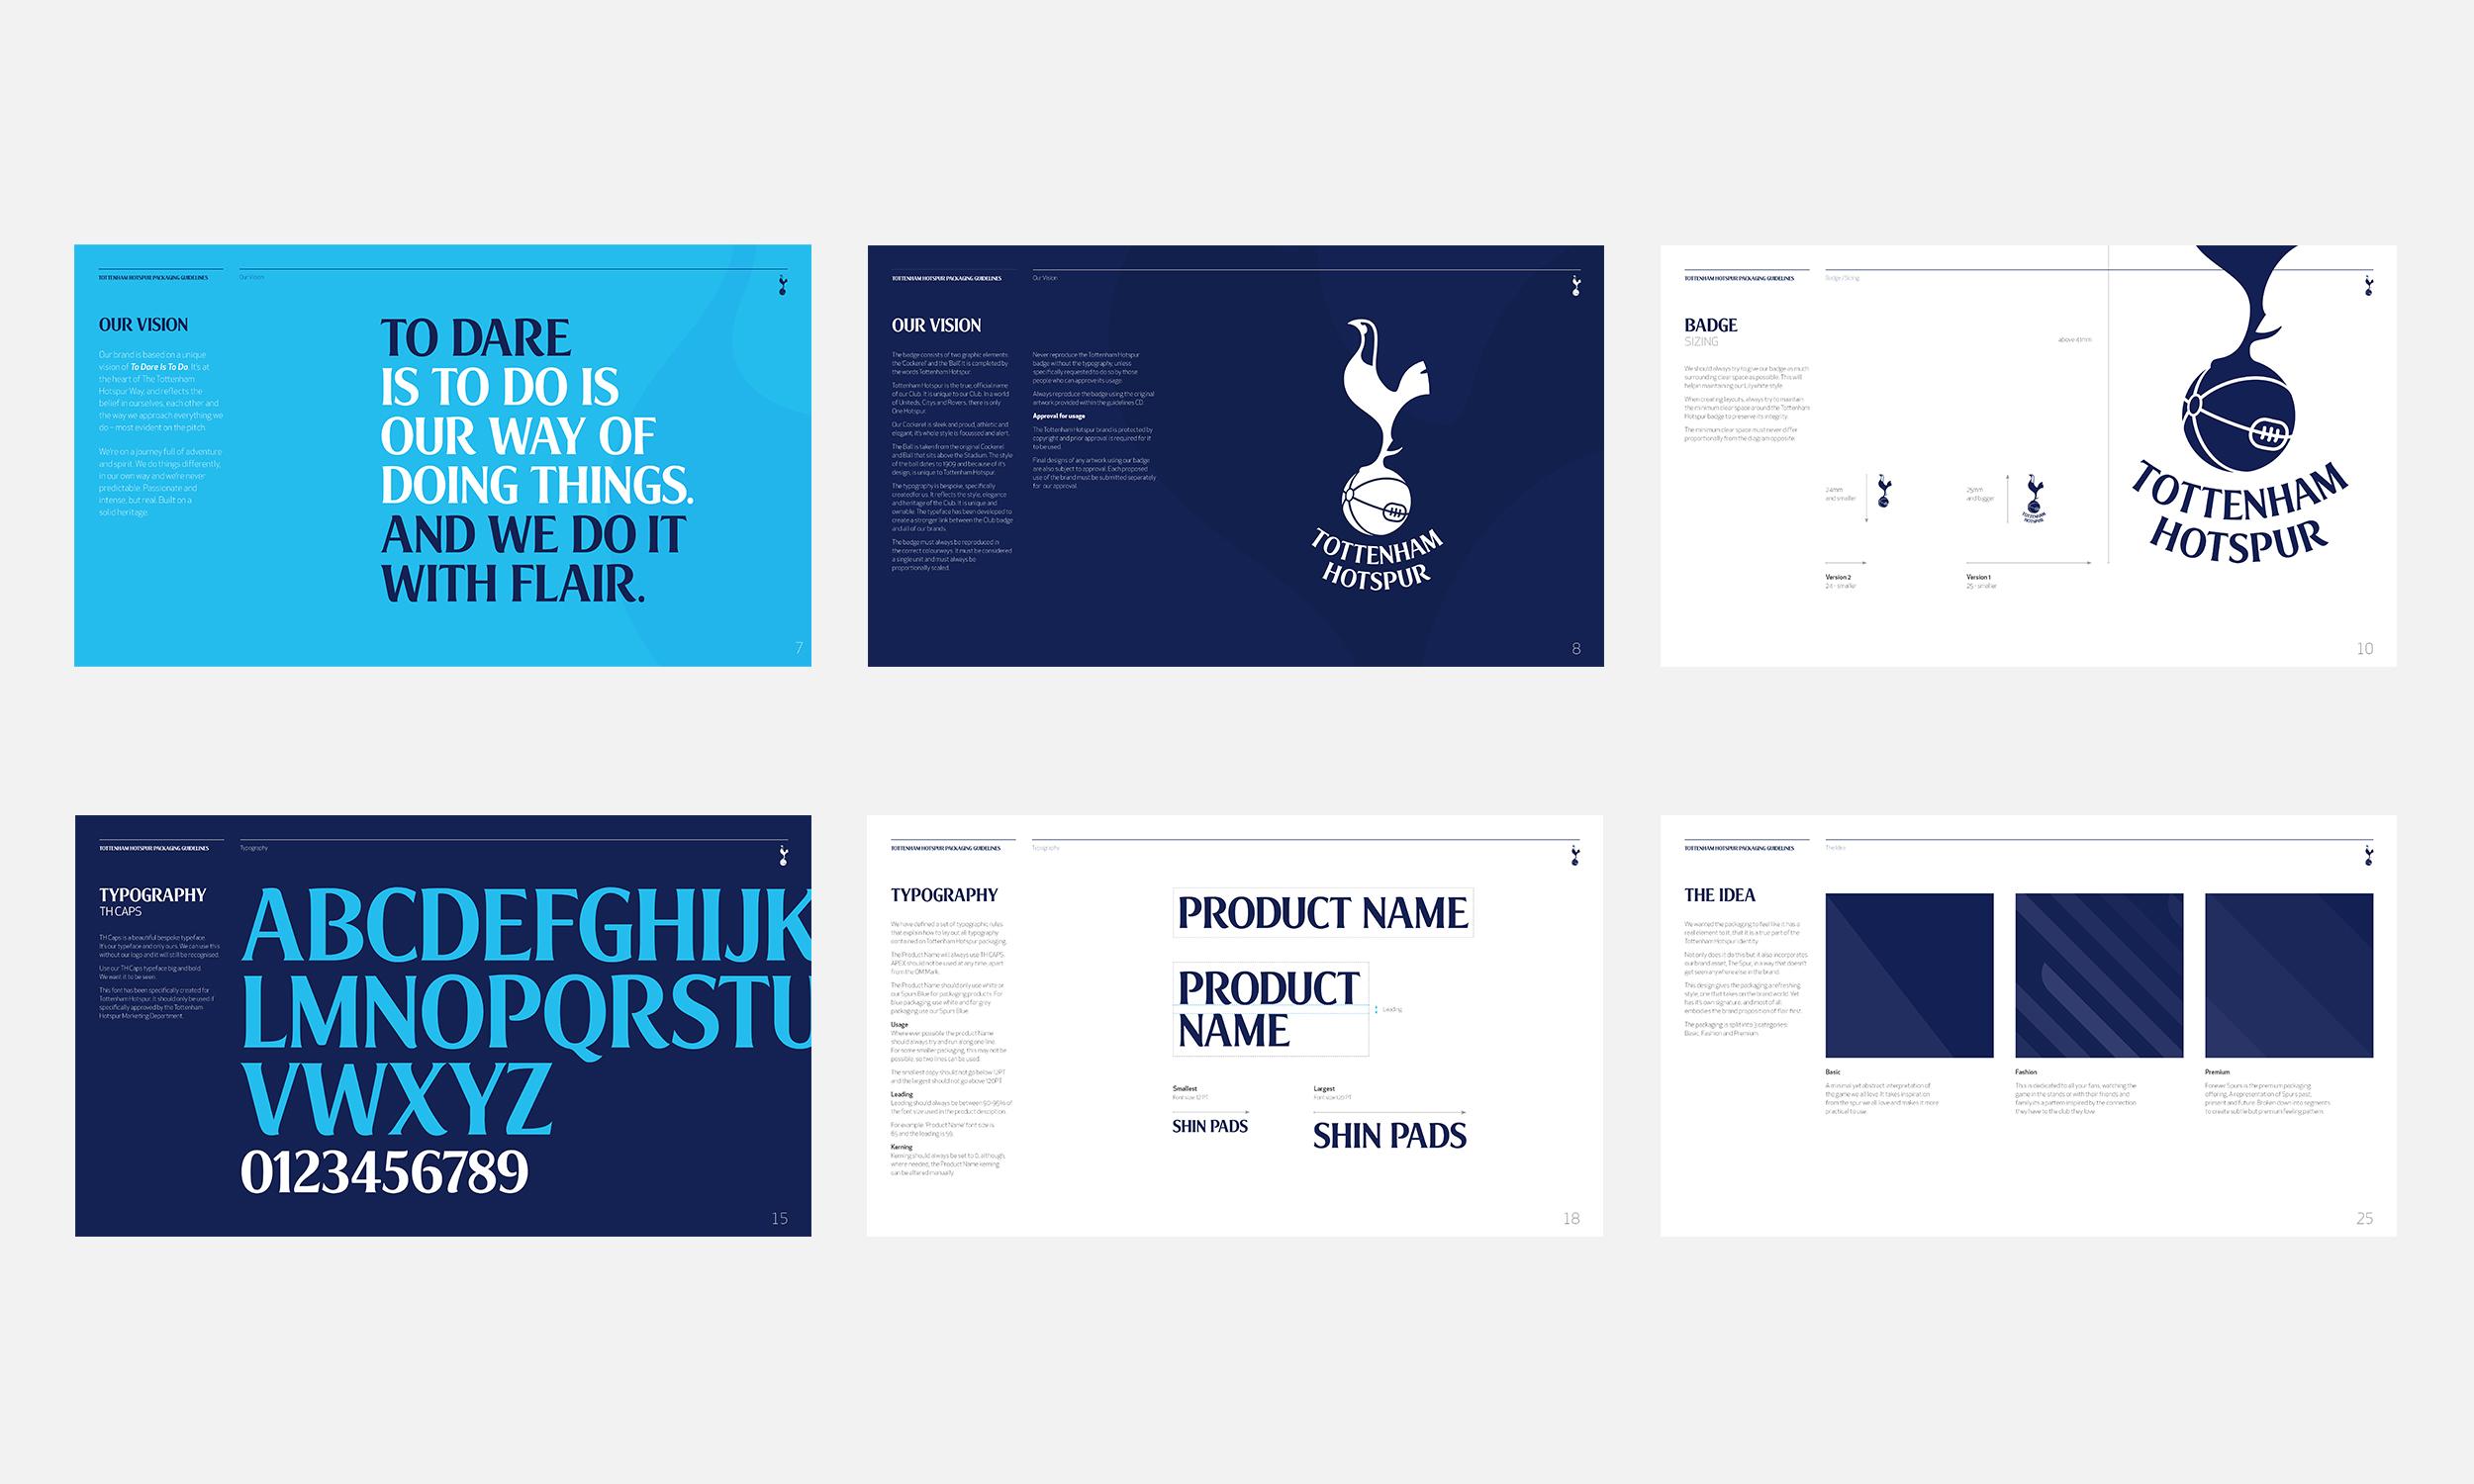 Chris Davies - Freelance Graphic Designer